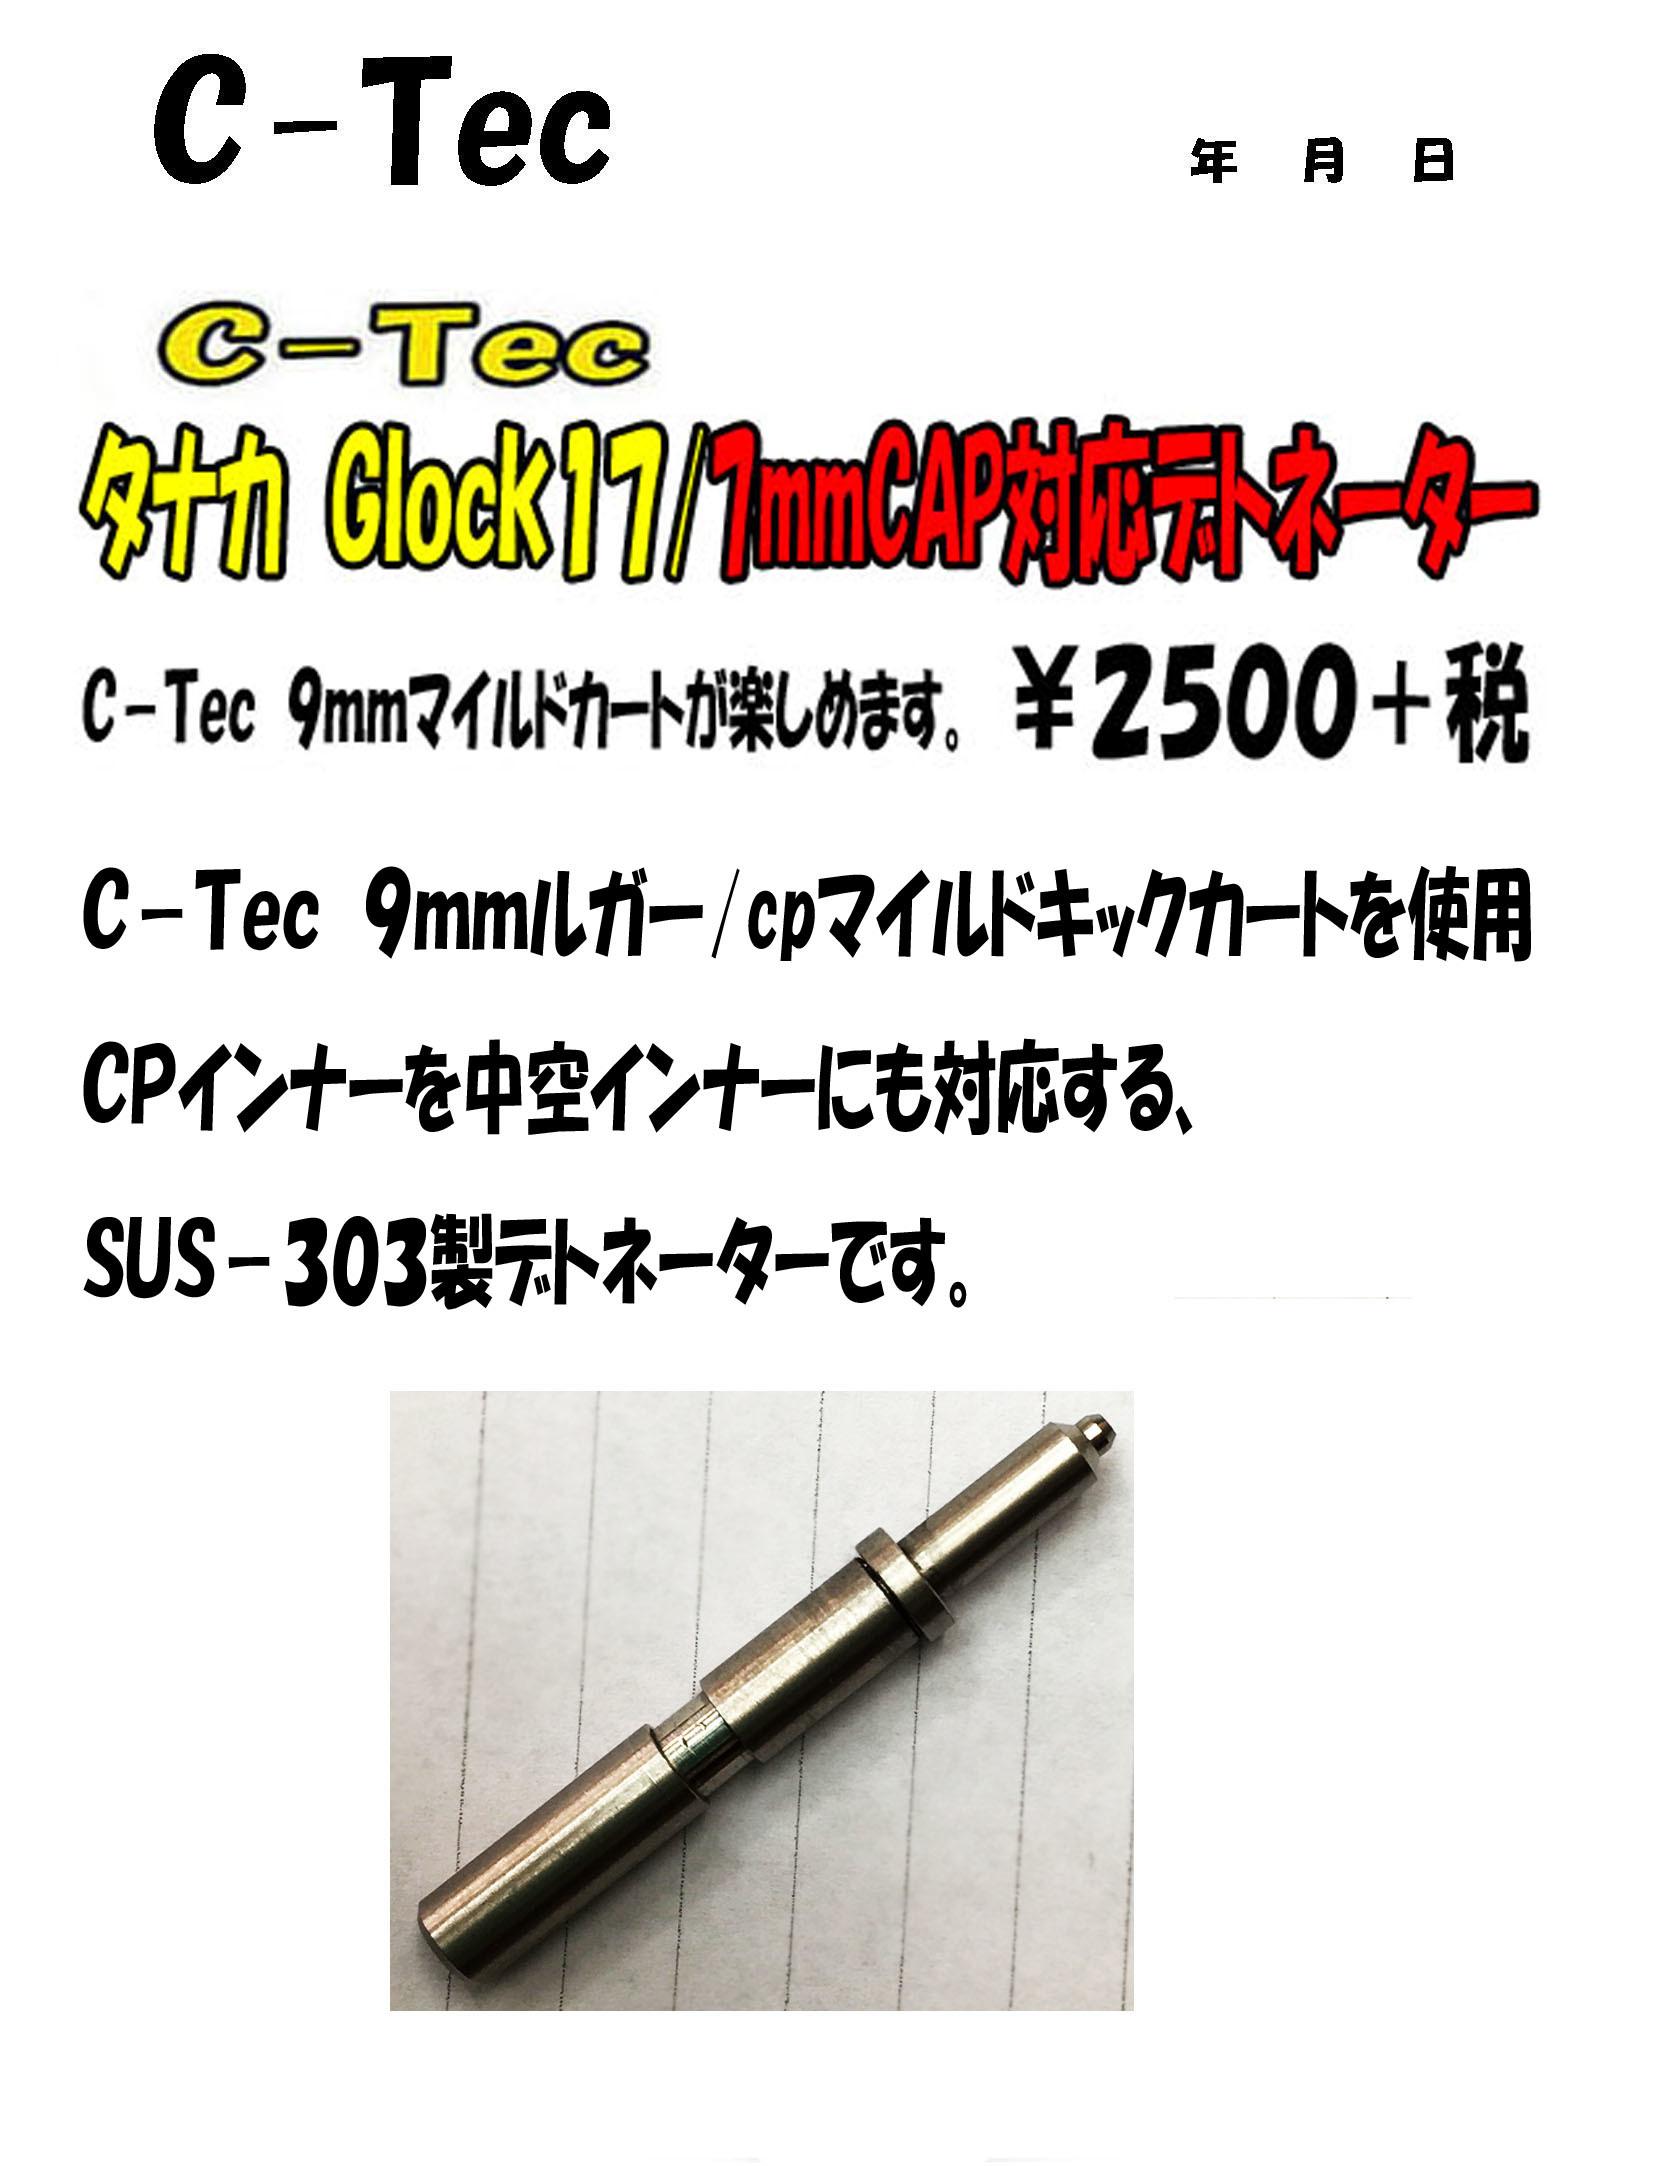 C-Tec タナカグロック17/18用 7mmCAP対応デトネーター_f0131995_14013191.jpg